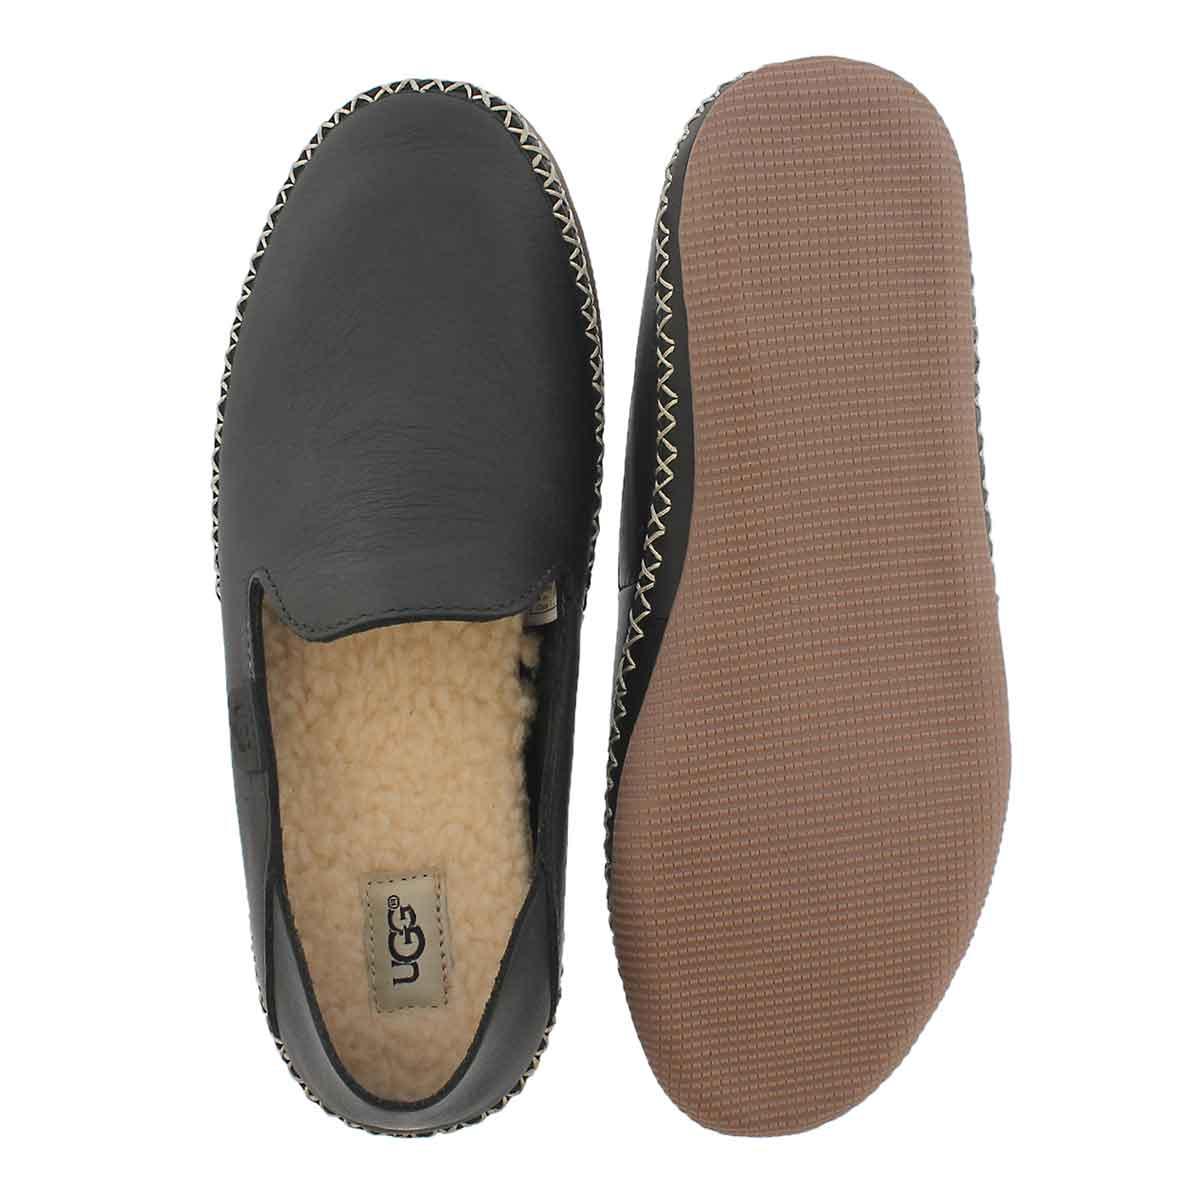 Lds Elodie black casual slip on shoe